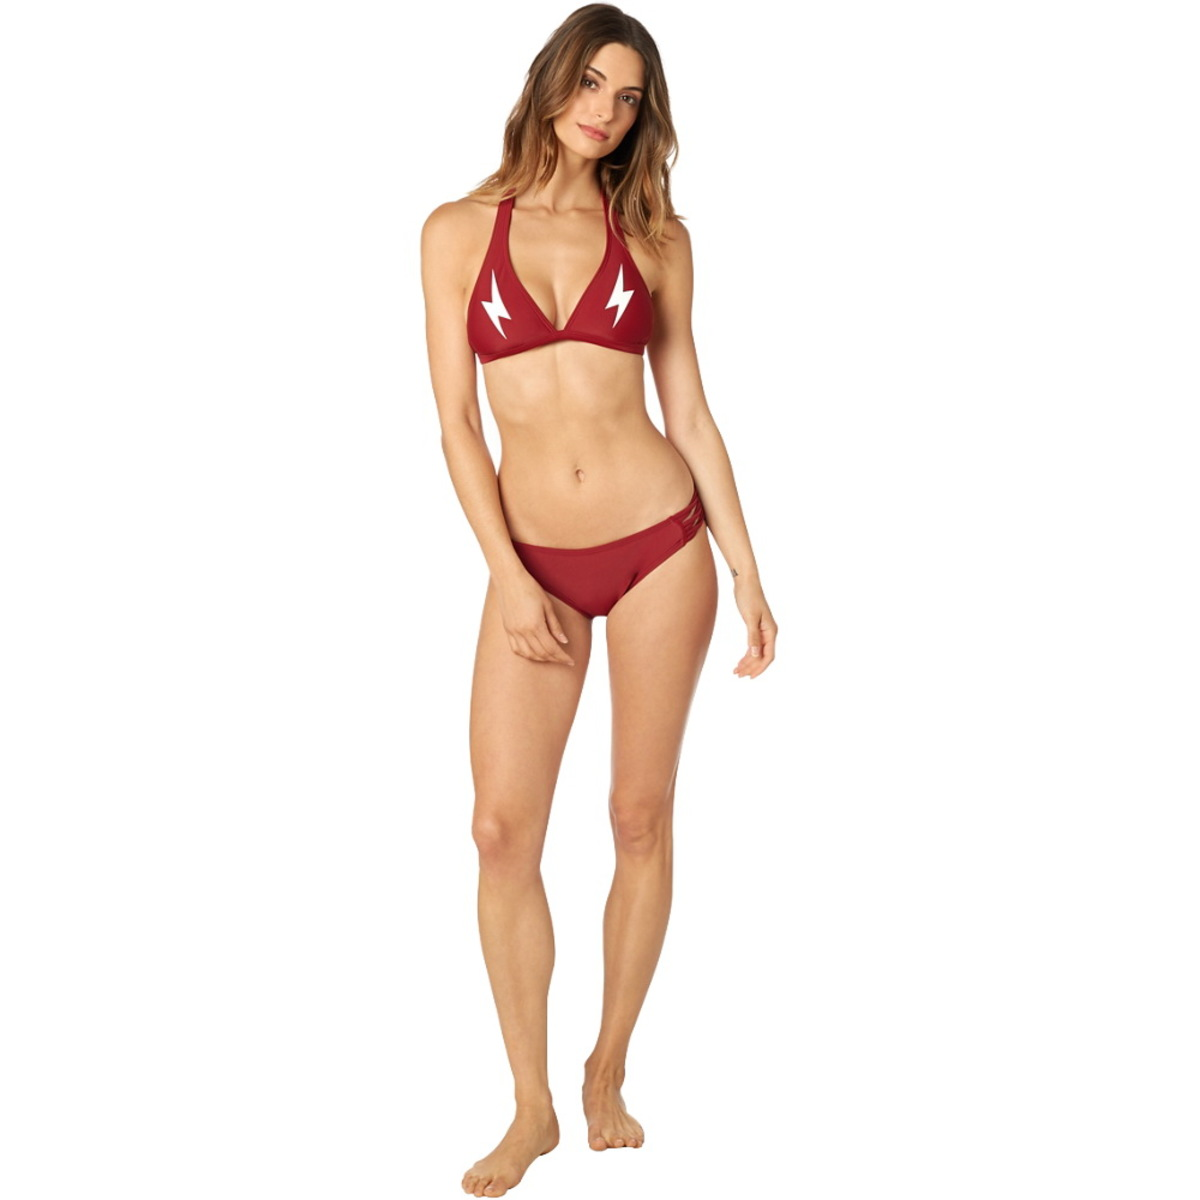 FOX Női Bikini - Throttle Maniac - Kötőfék - Sötét Piros - 21074-208 ... 308fae7067